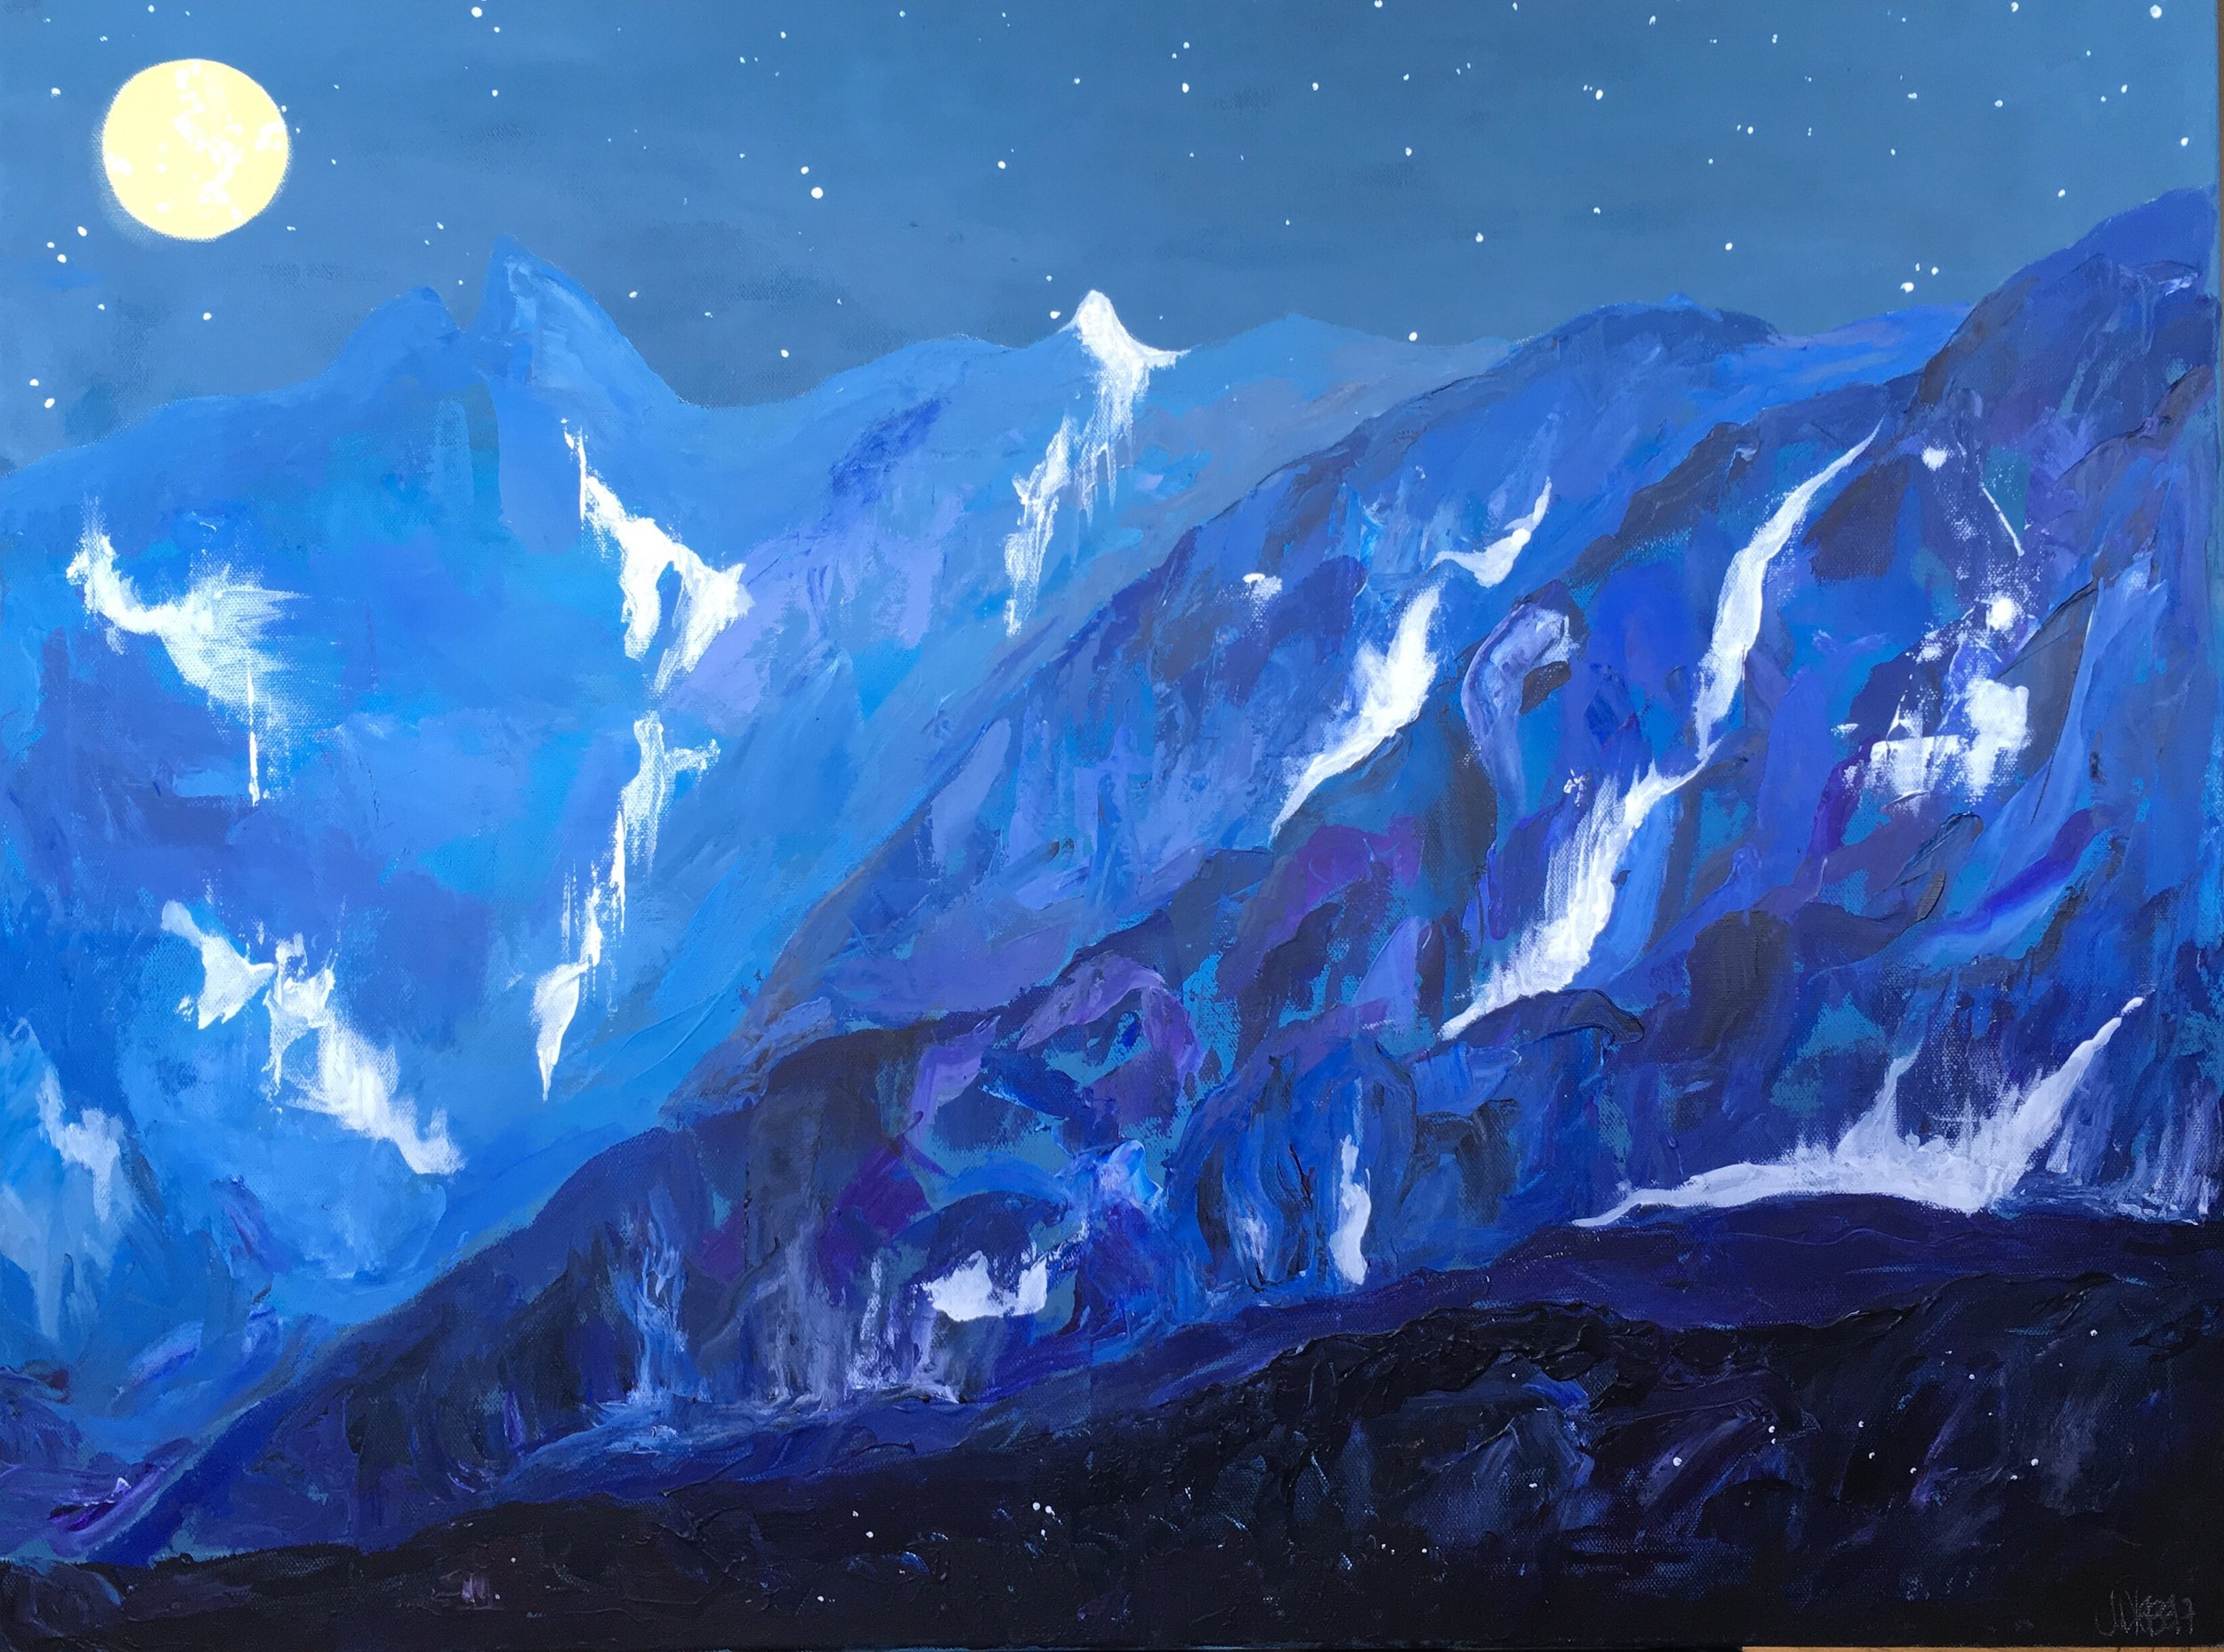 Like the Mountain / 24x30 / Acrylic / $400